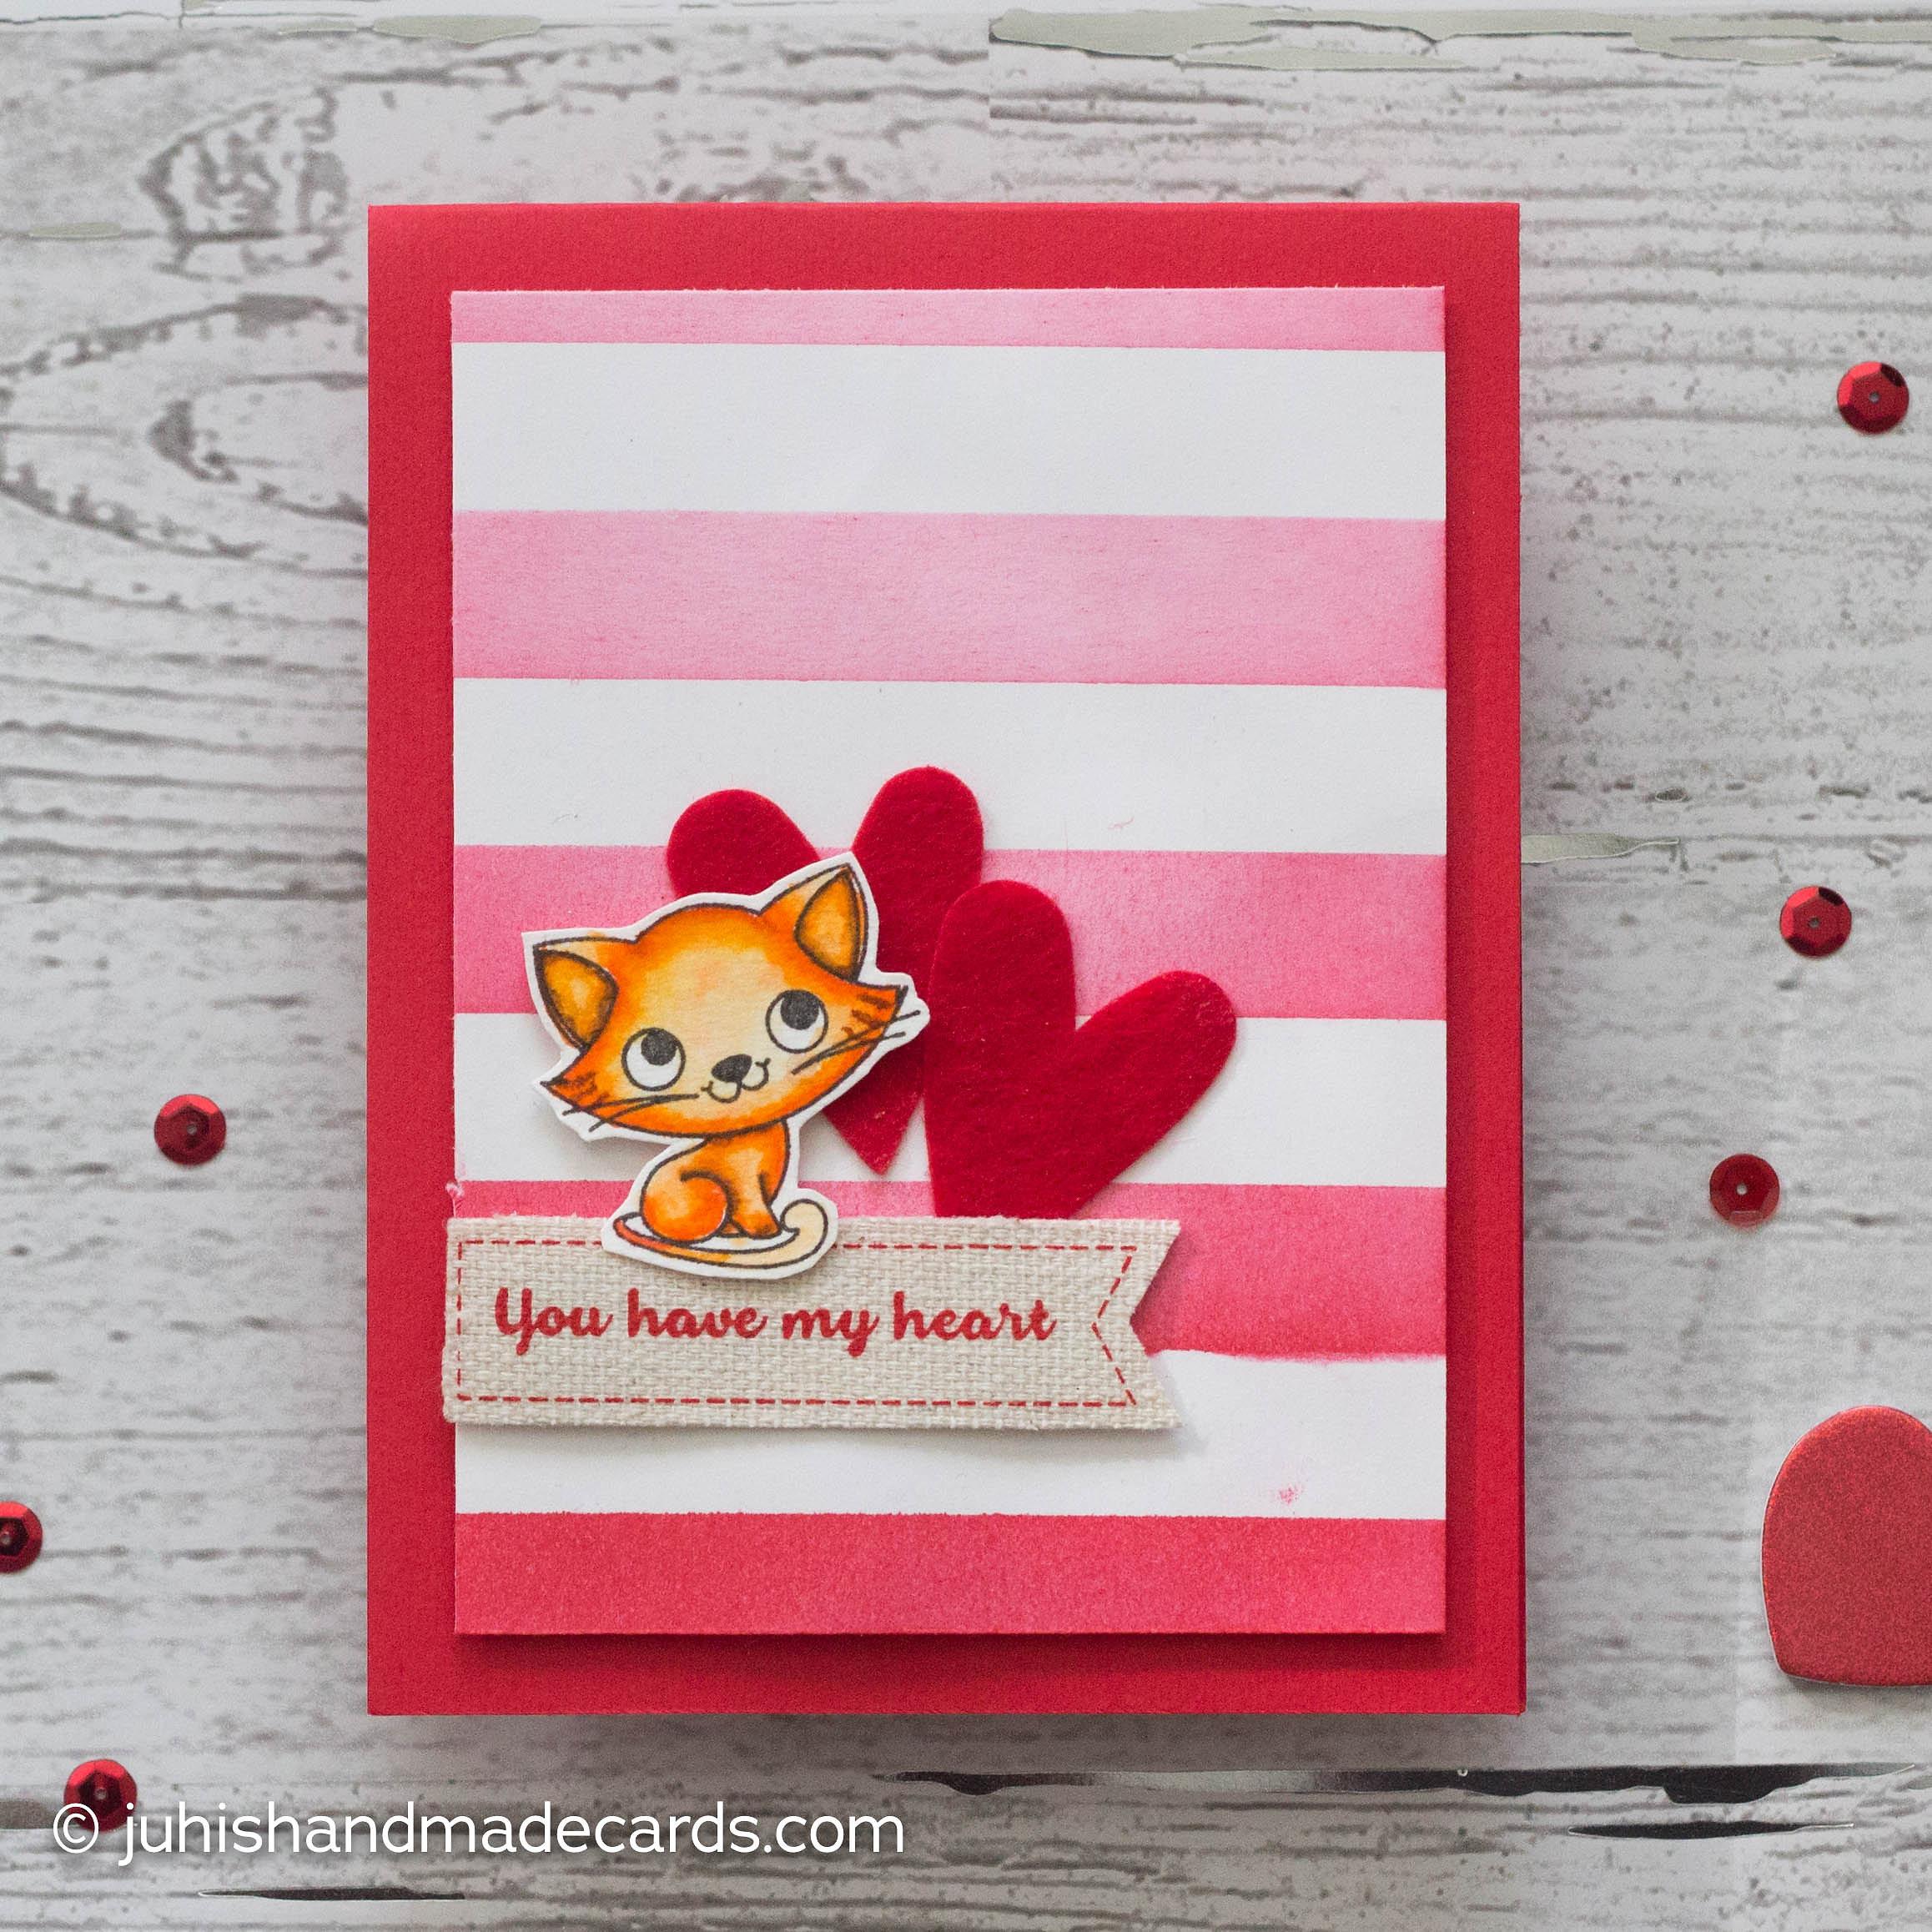 Juhis Handmade Cards